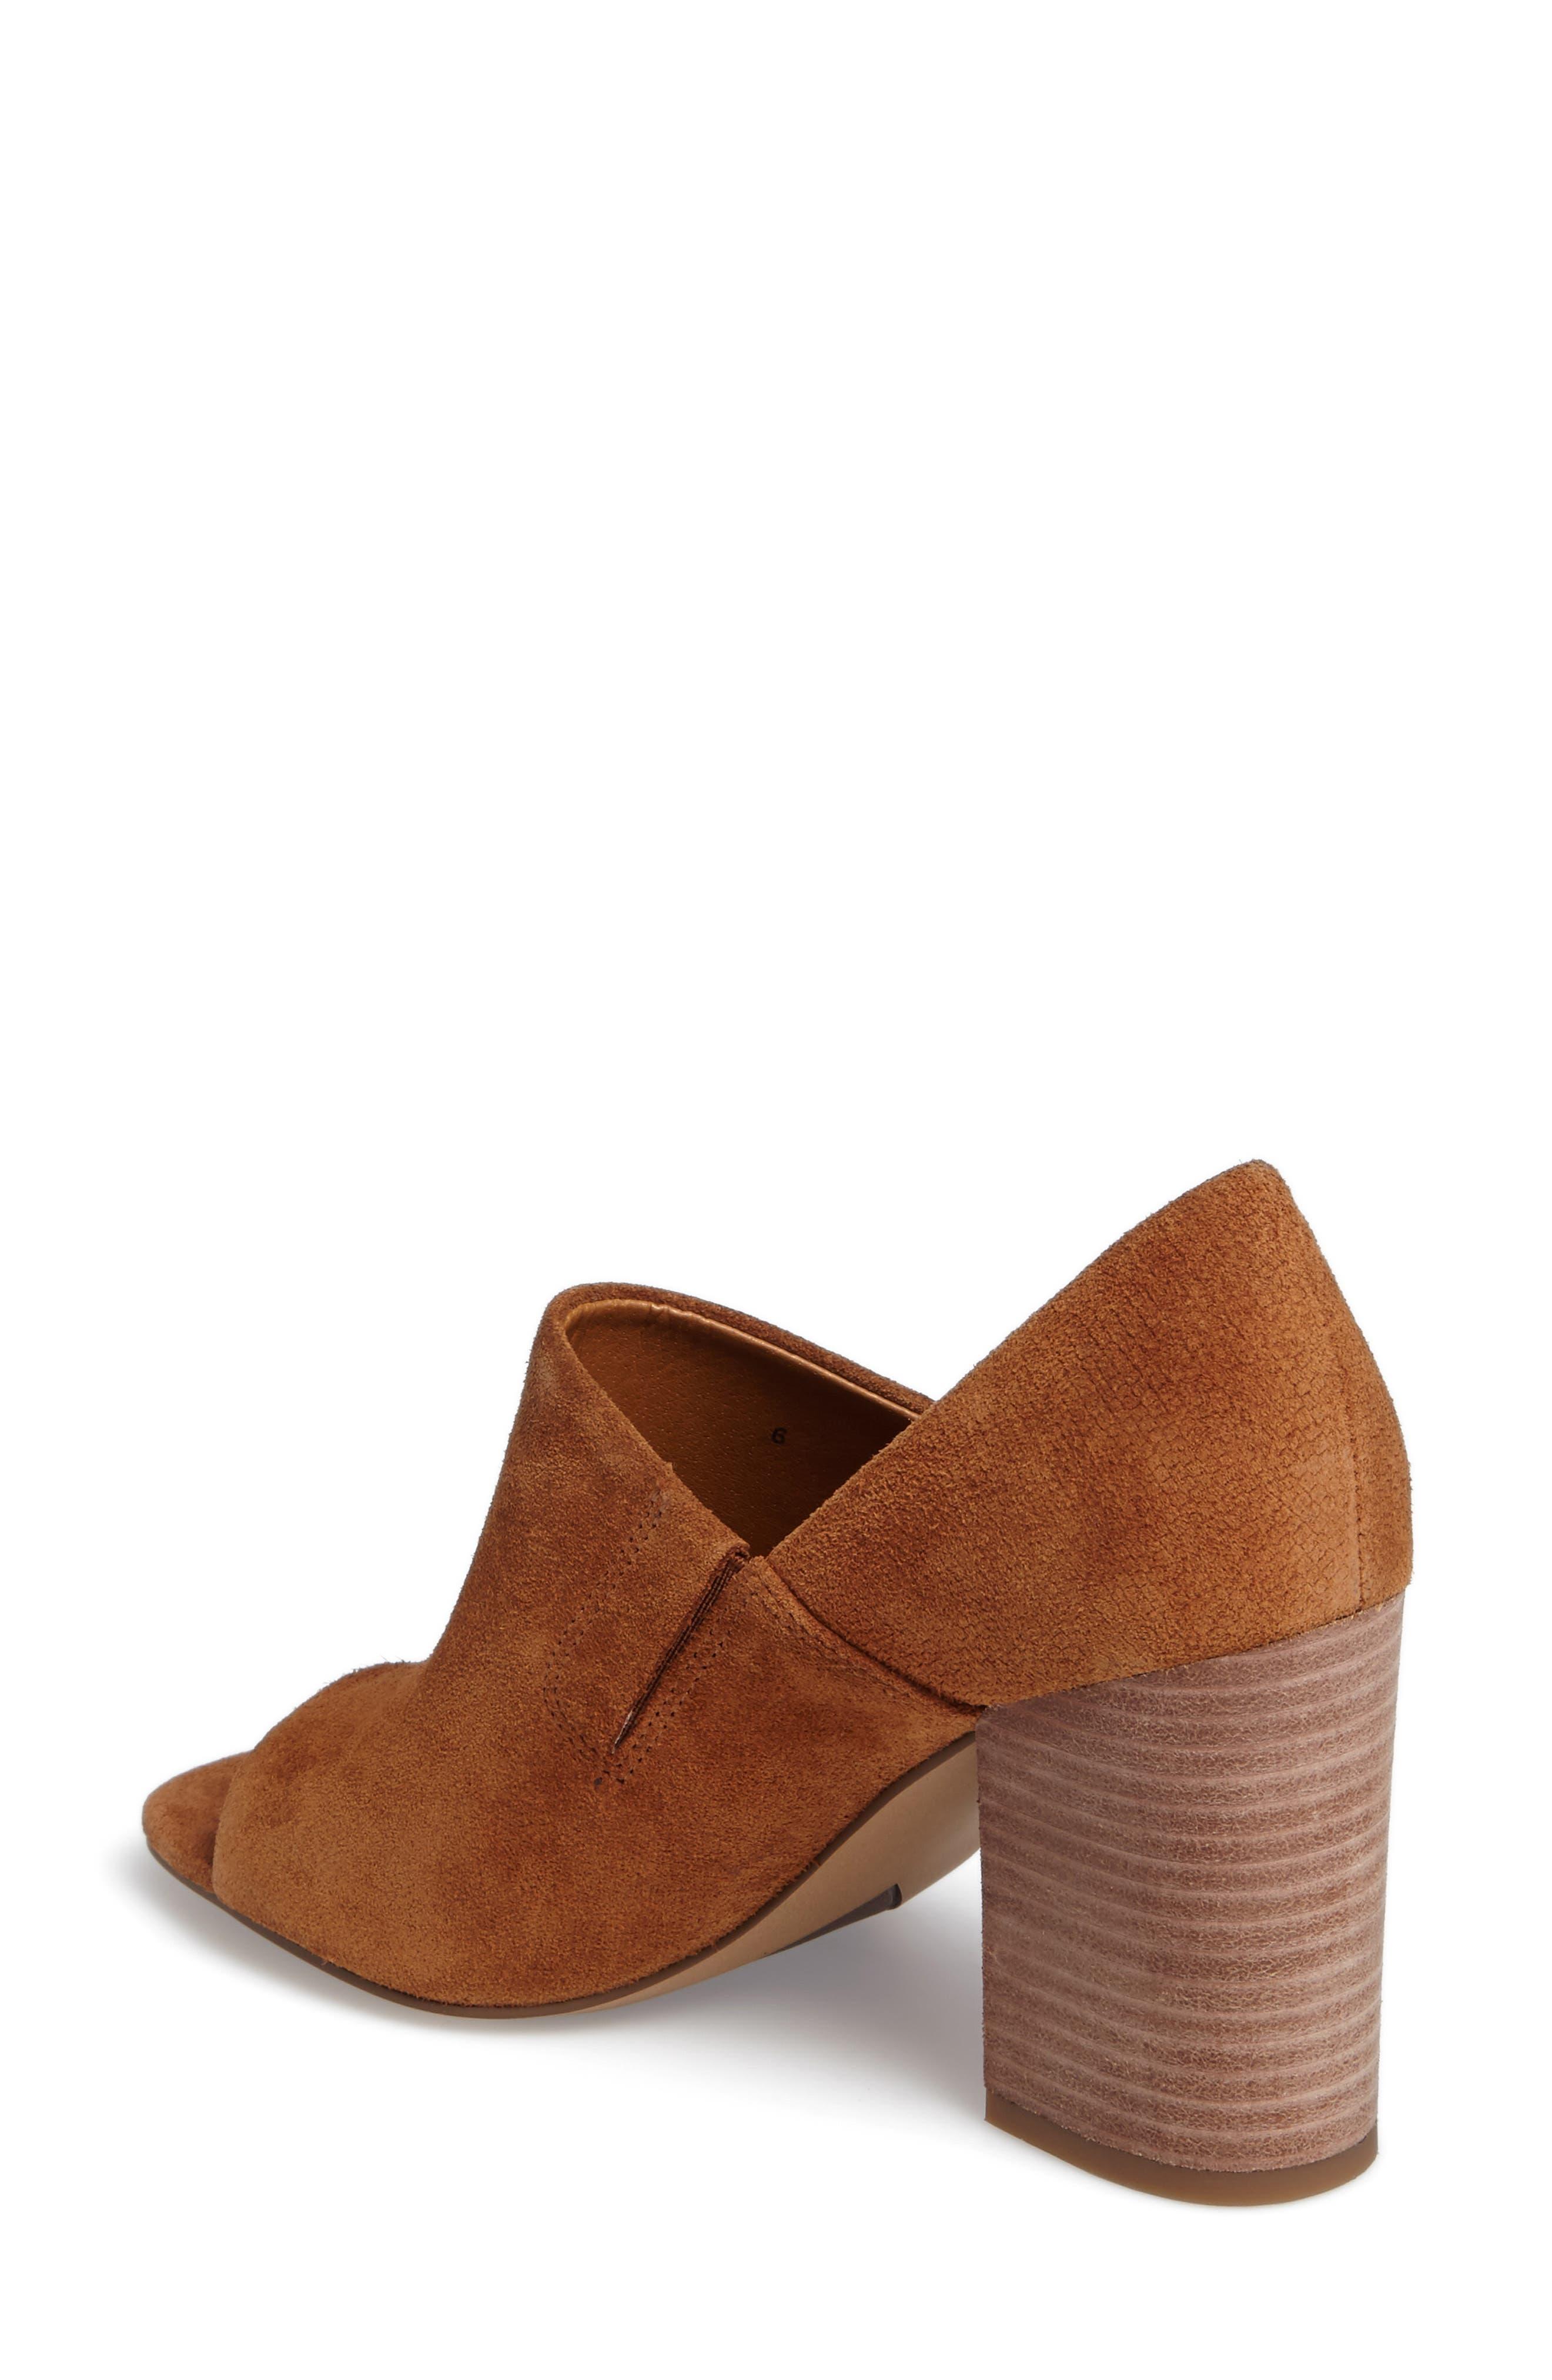 Ellison Block Heel Sandal,                             Alternate thumbnail 5, color,